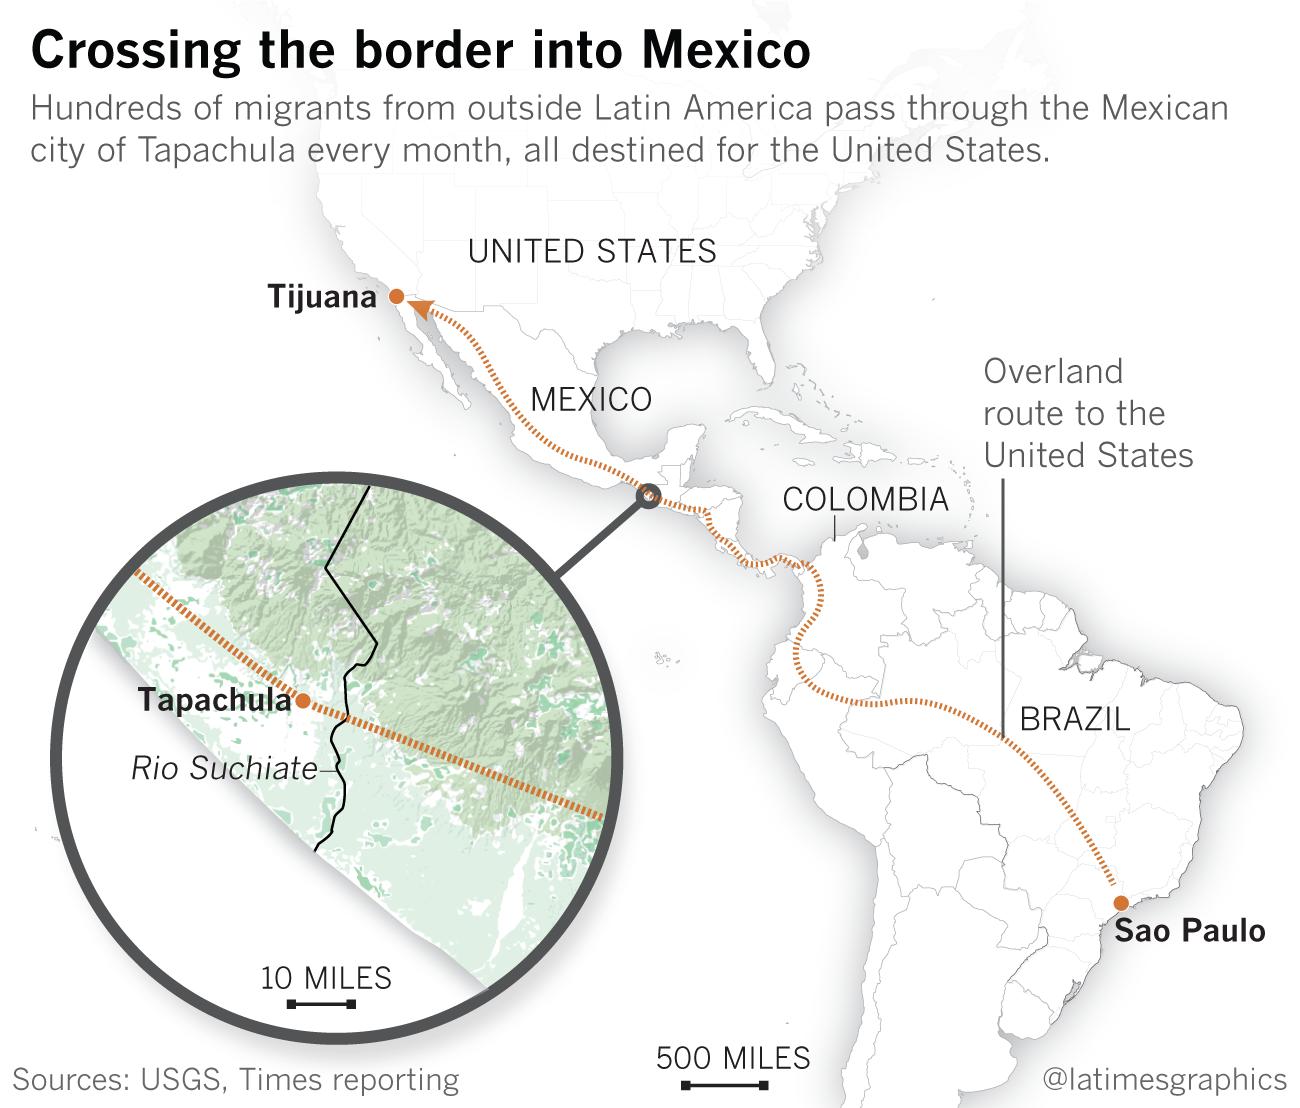 Central American migrant caravans - Wikipedia